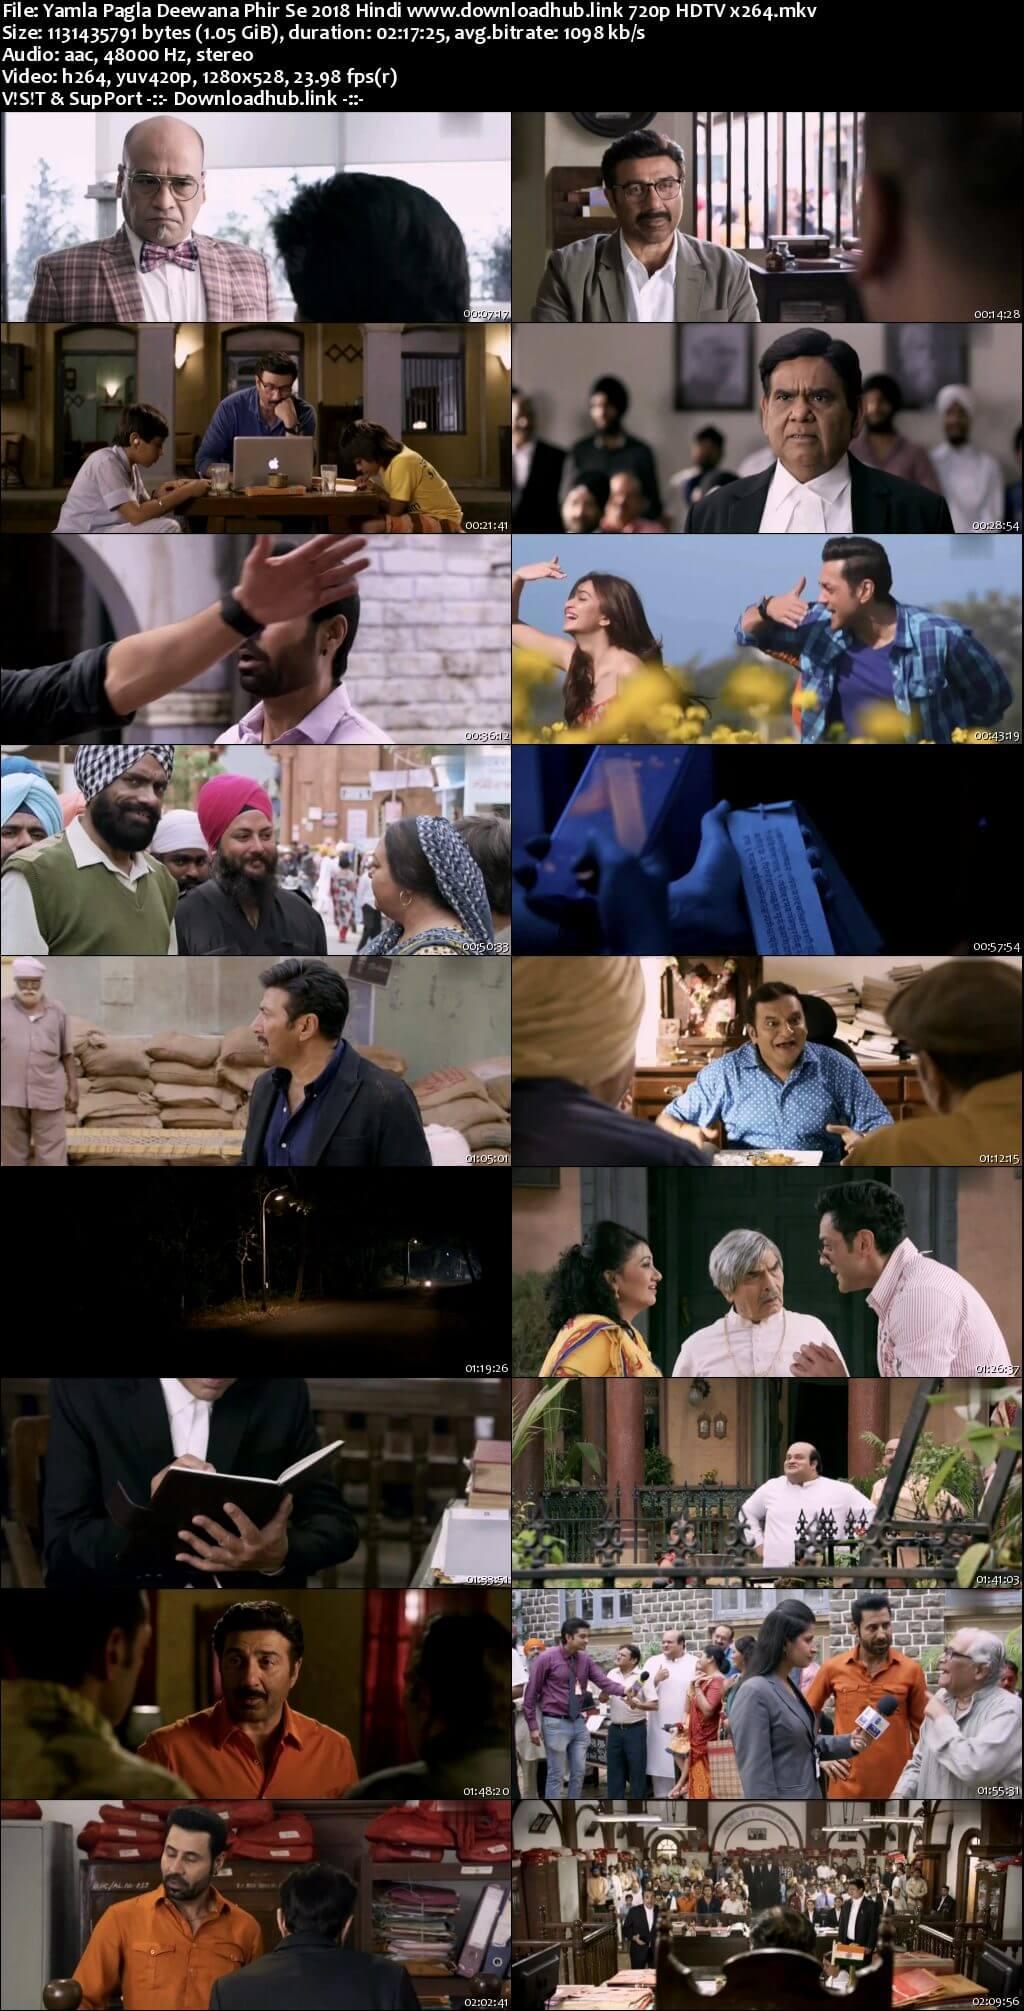 Yamla Pagla Deewana Phir Se 2018 Hindi 720p HDTV x264